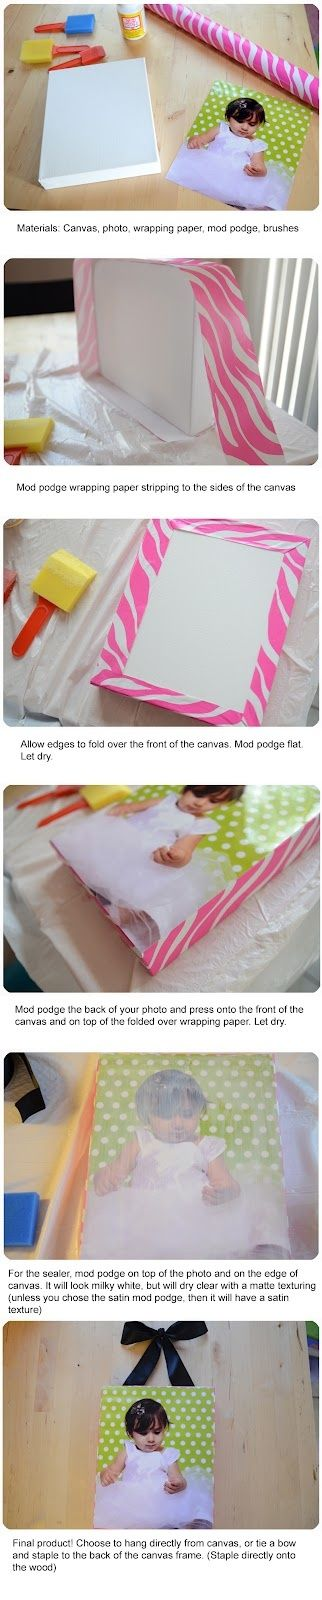 DIY Canvas Photo - modge podge & photo on wood!   Kids   Pinterest ...